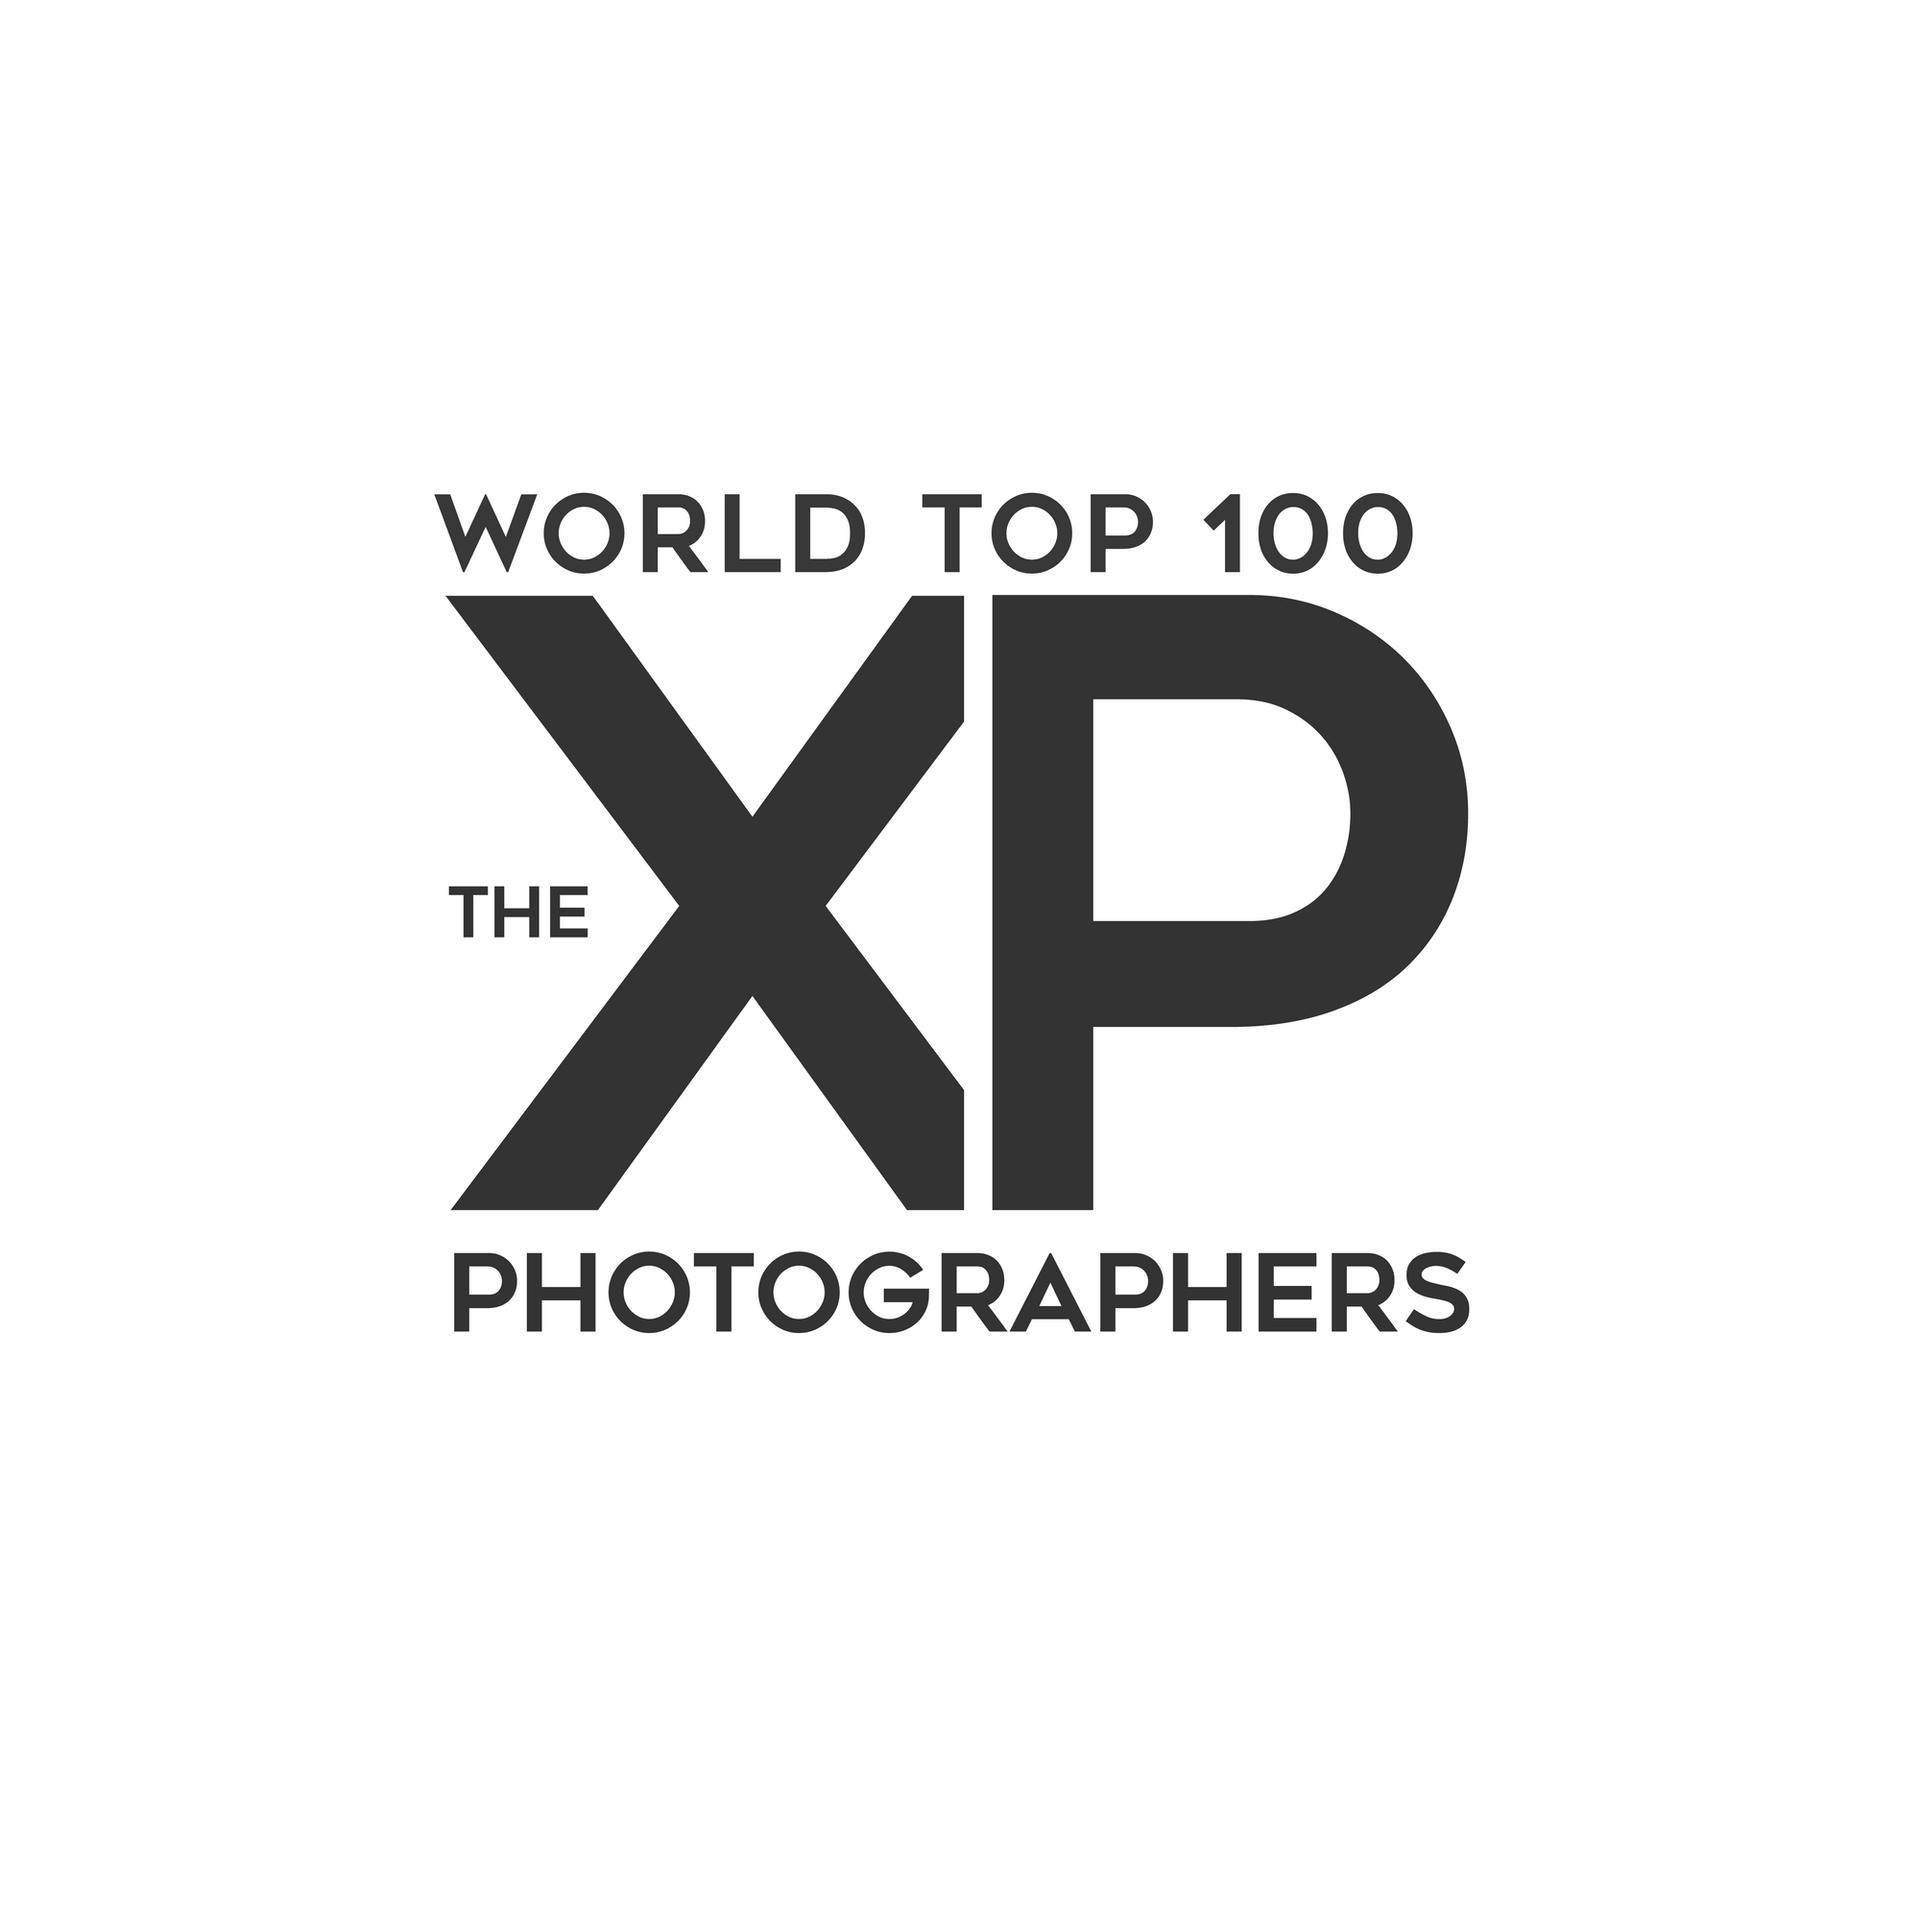 World Top 100